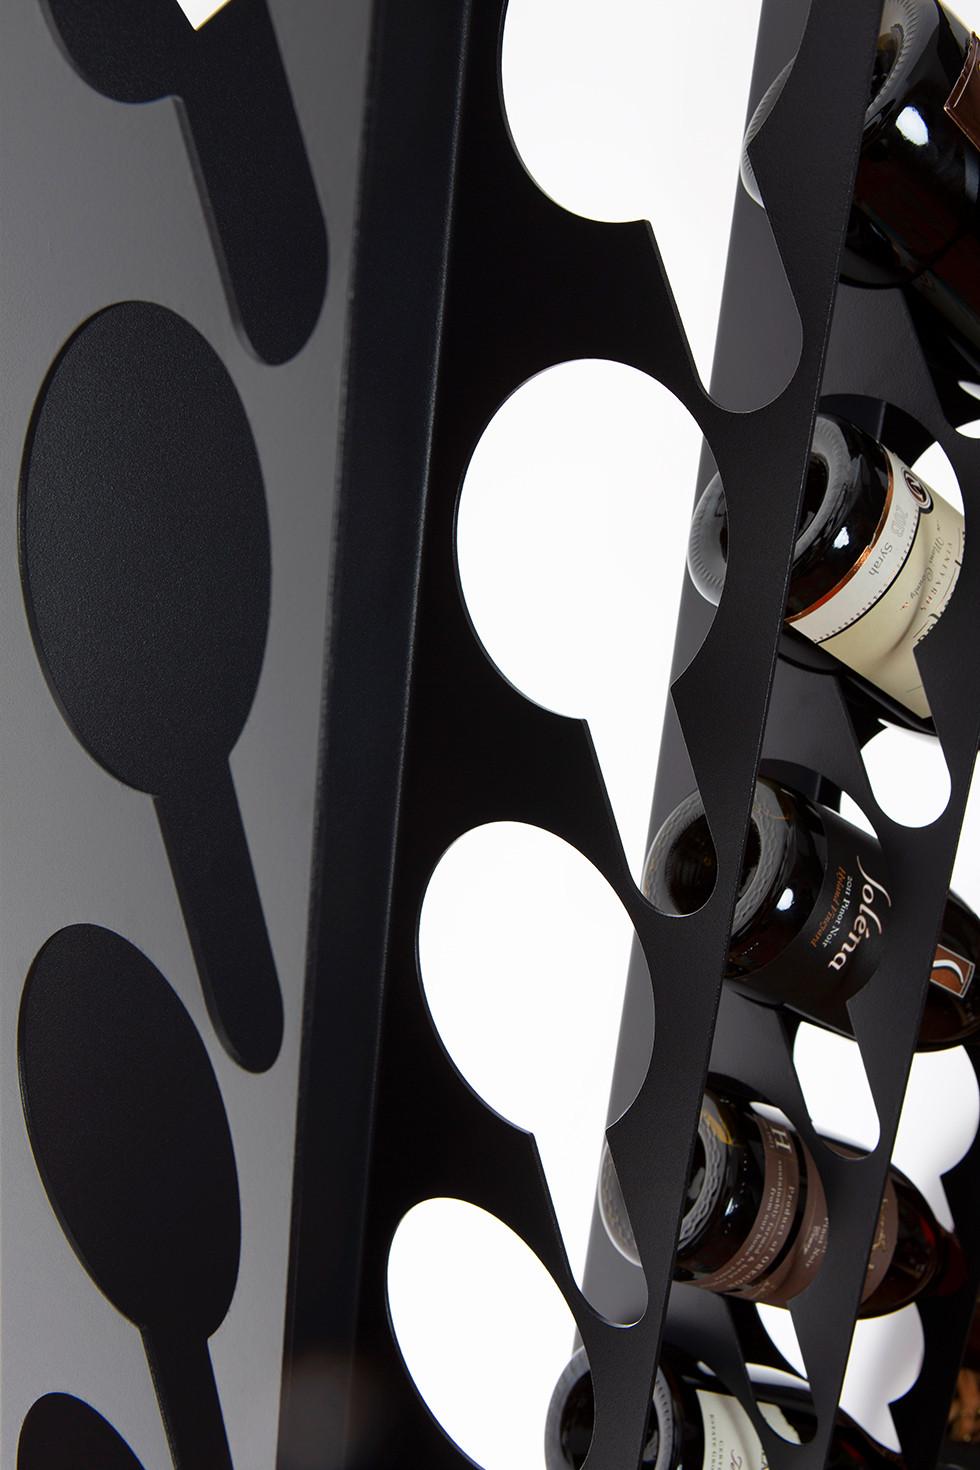 steel-grape-photograph-1.jpg